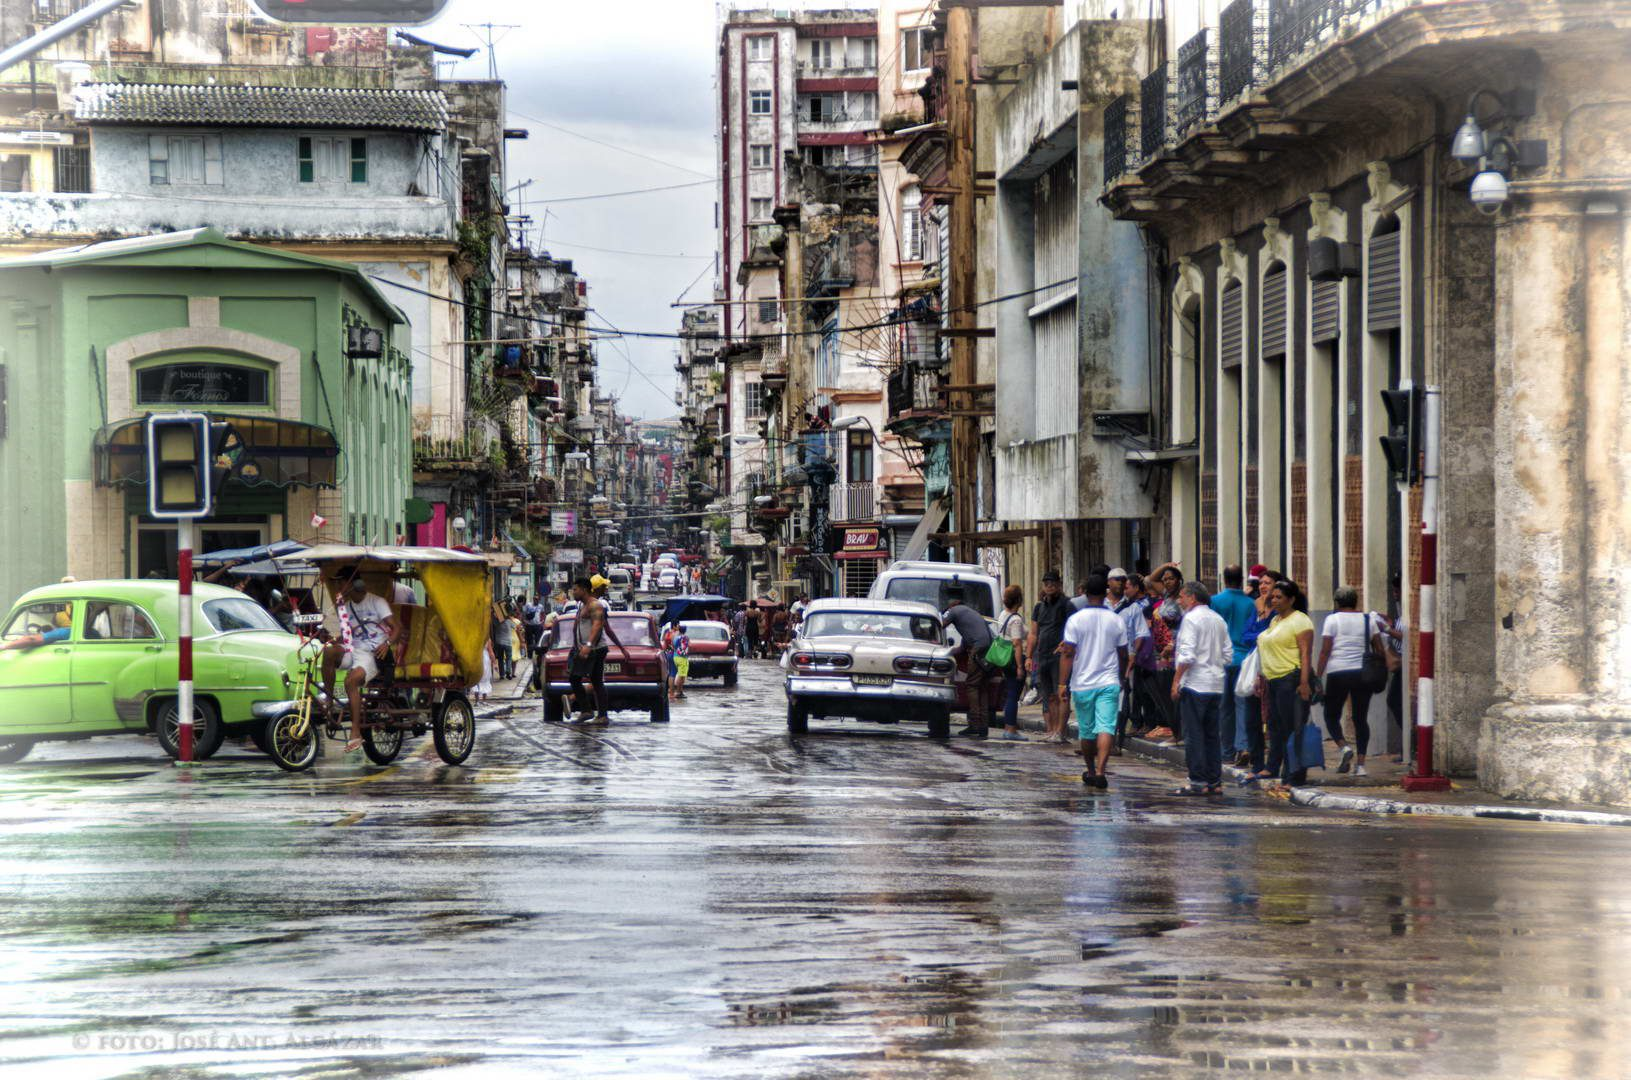 Permalink to: Mi viaje a La Habana…